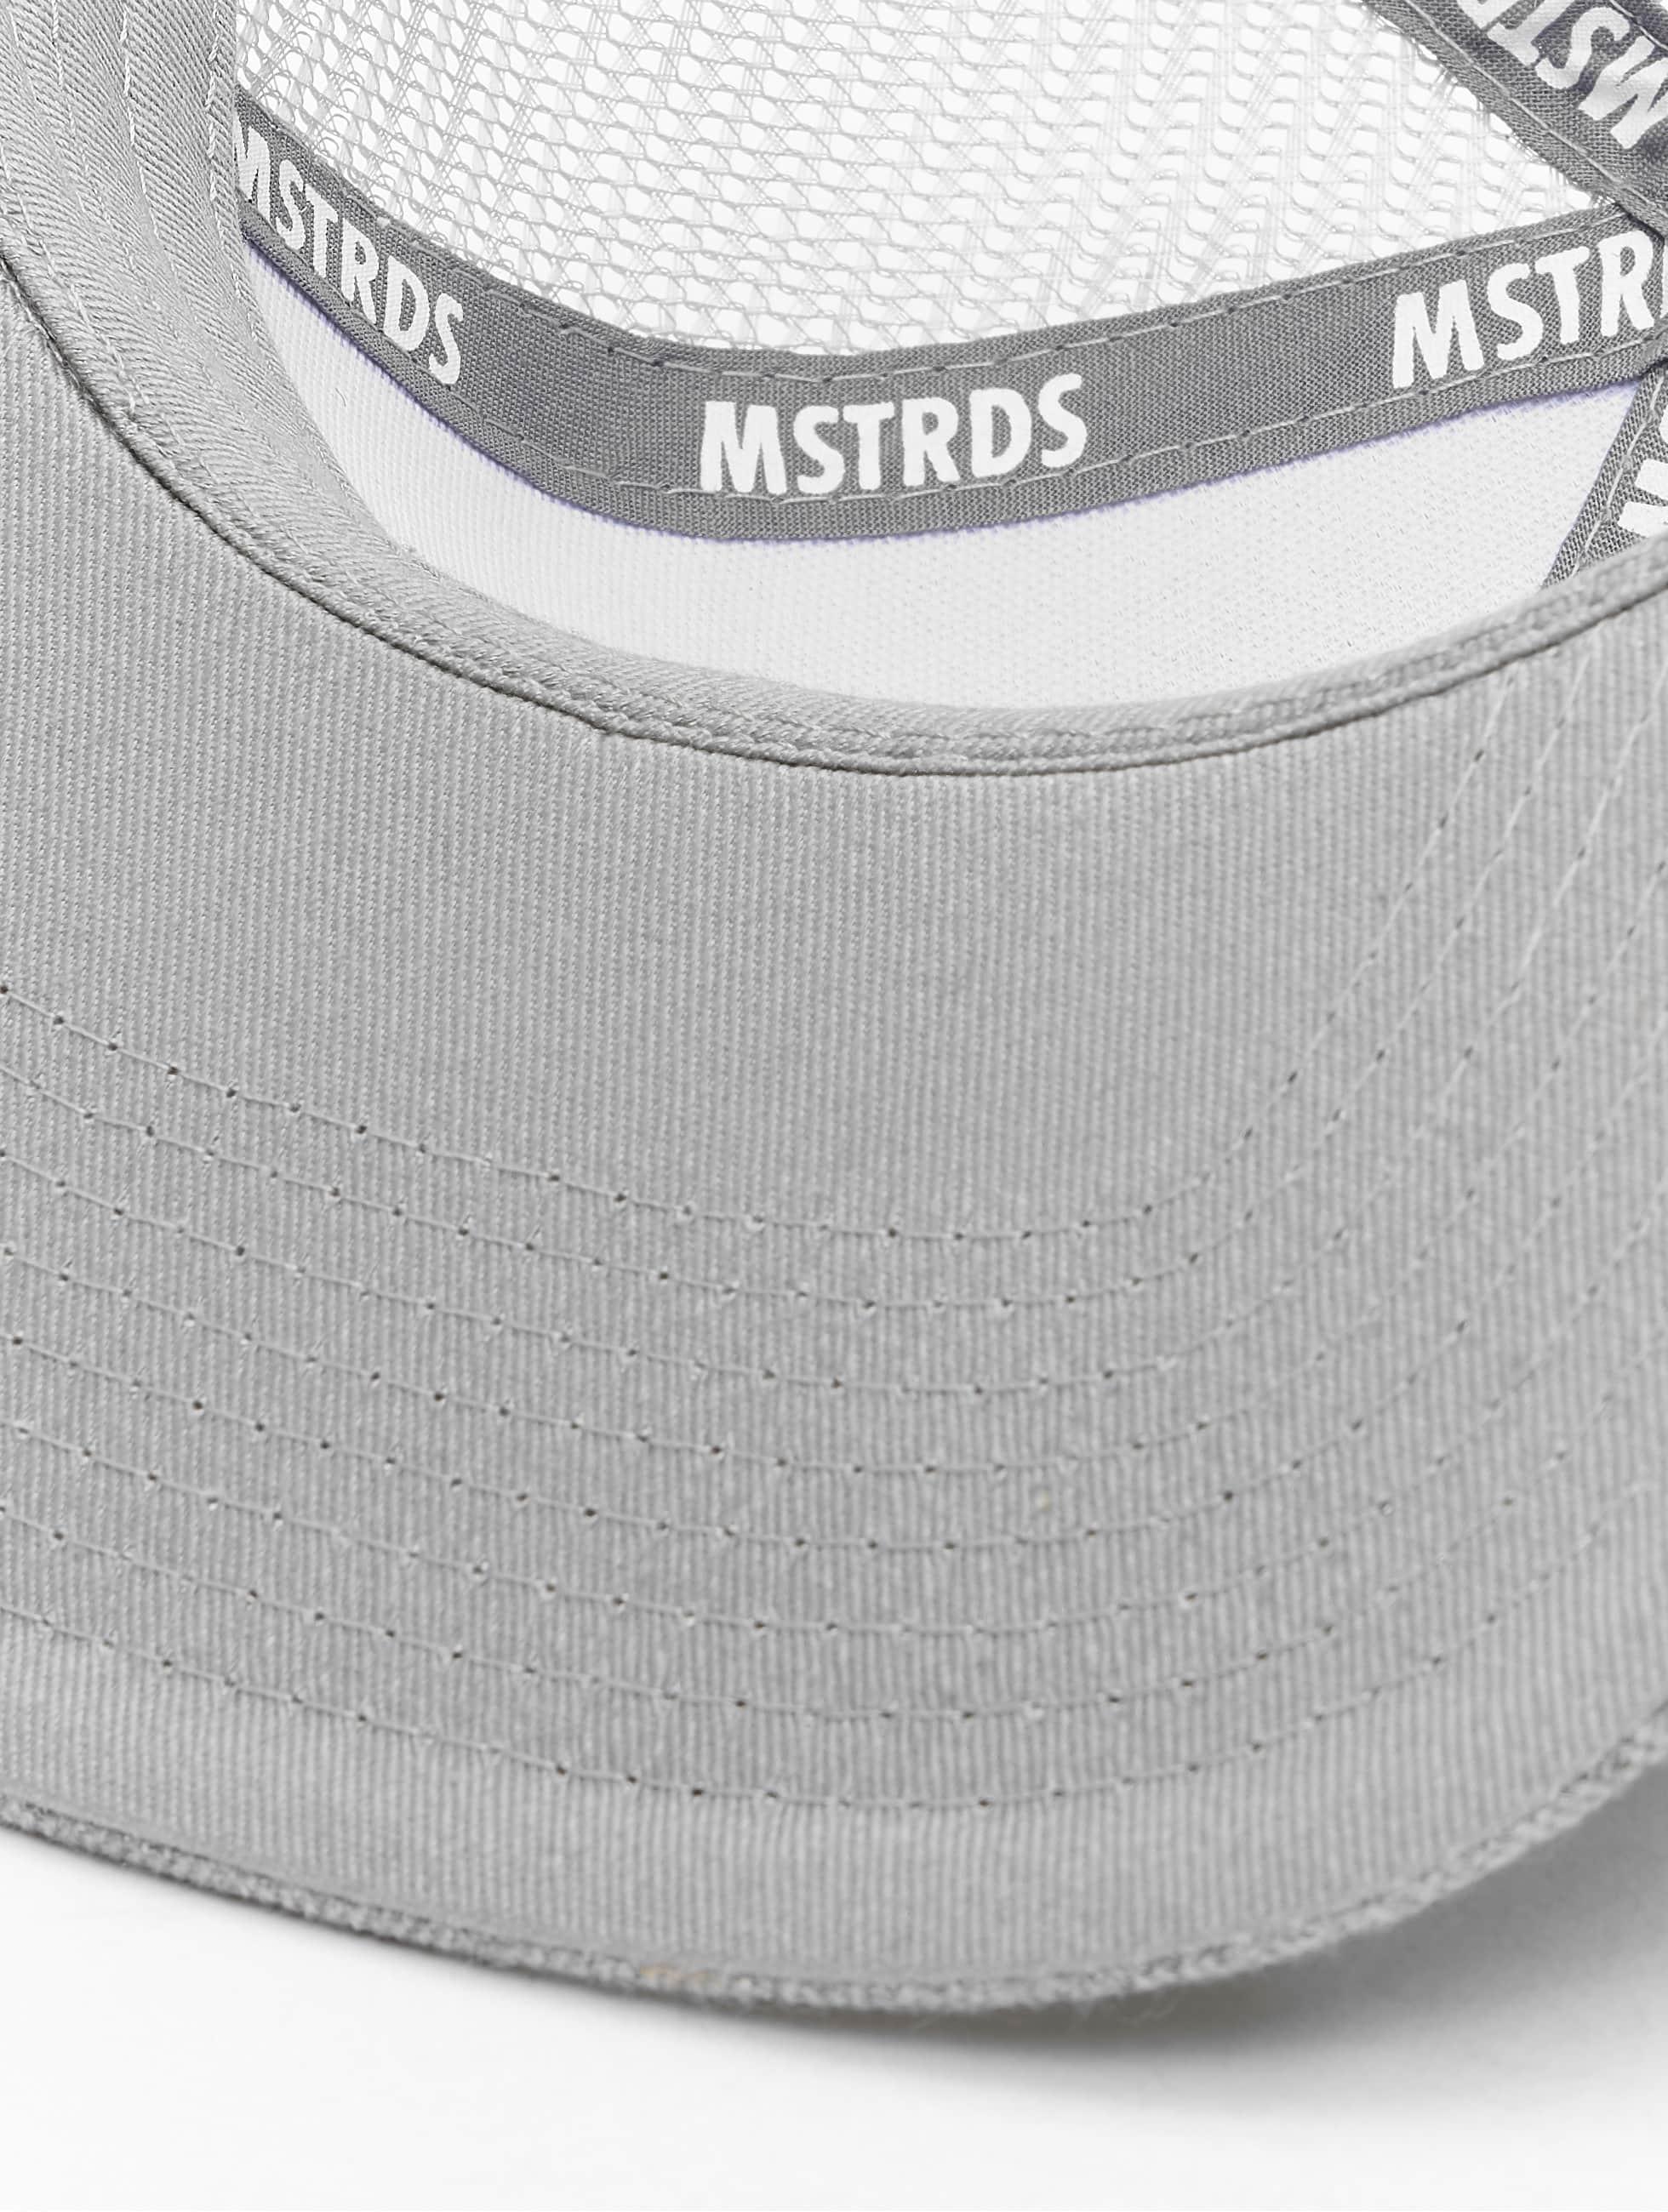 MSTRDS Trucker Cap Money Clip grey